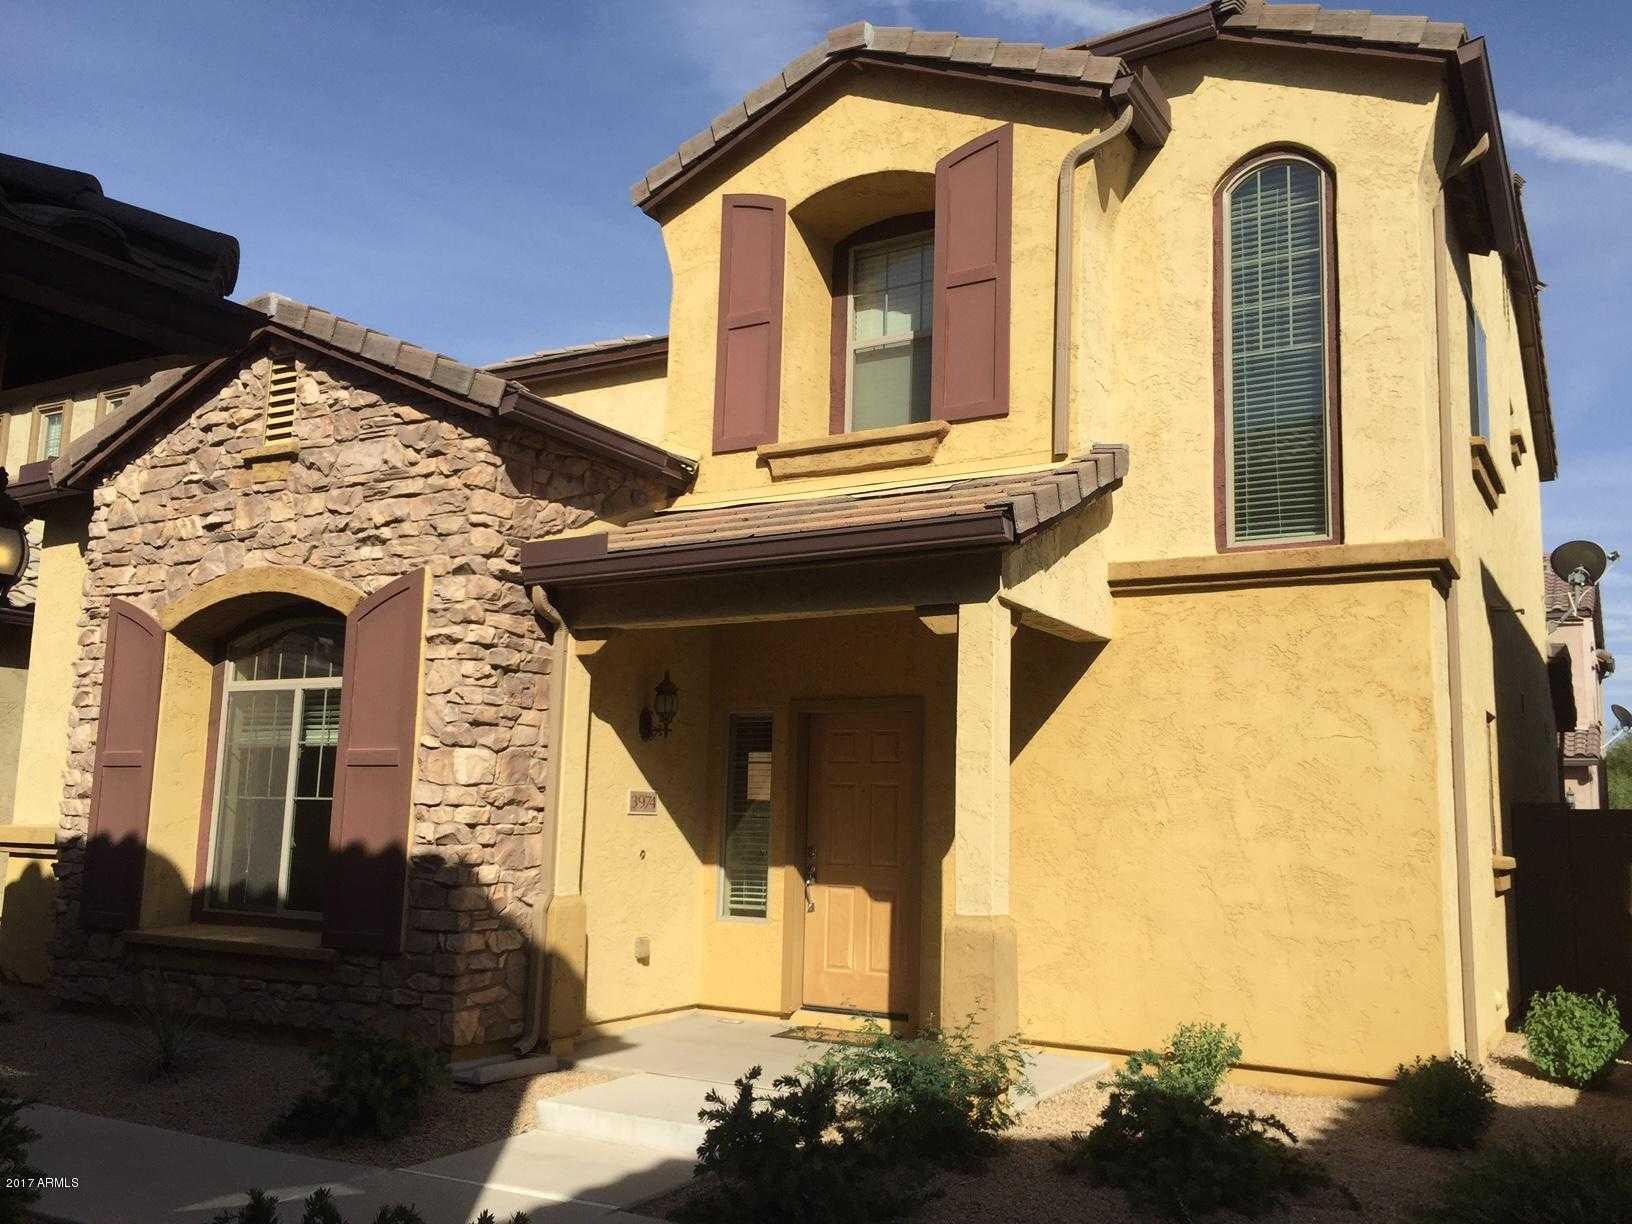 $1,875 - 3Br/3Ba - Home for Sale in Desert Ridge Superblock 11 Parcel 1b, Phoenix